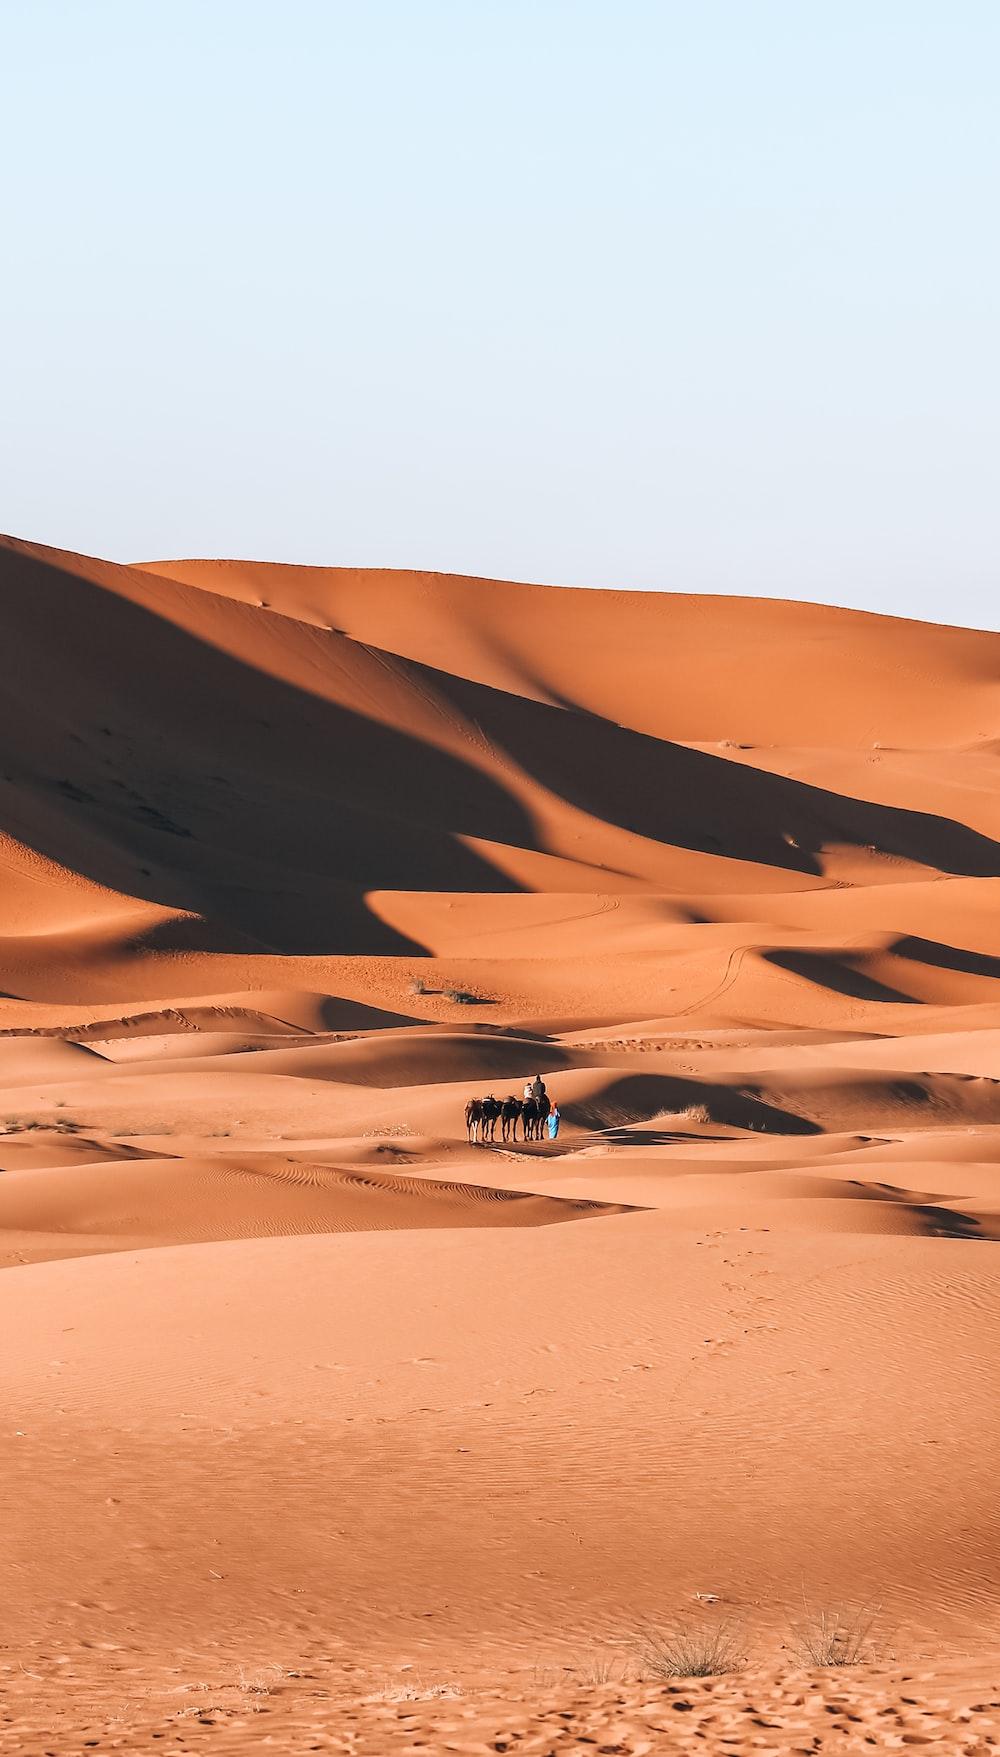 white and brown desert under blue sky during daytime